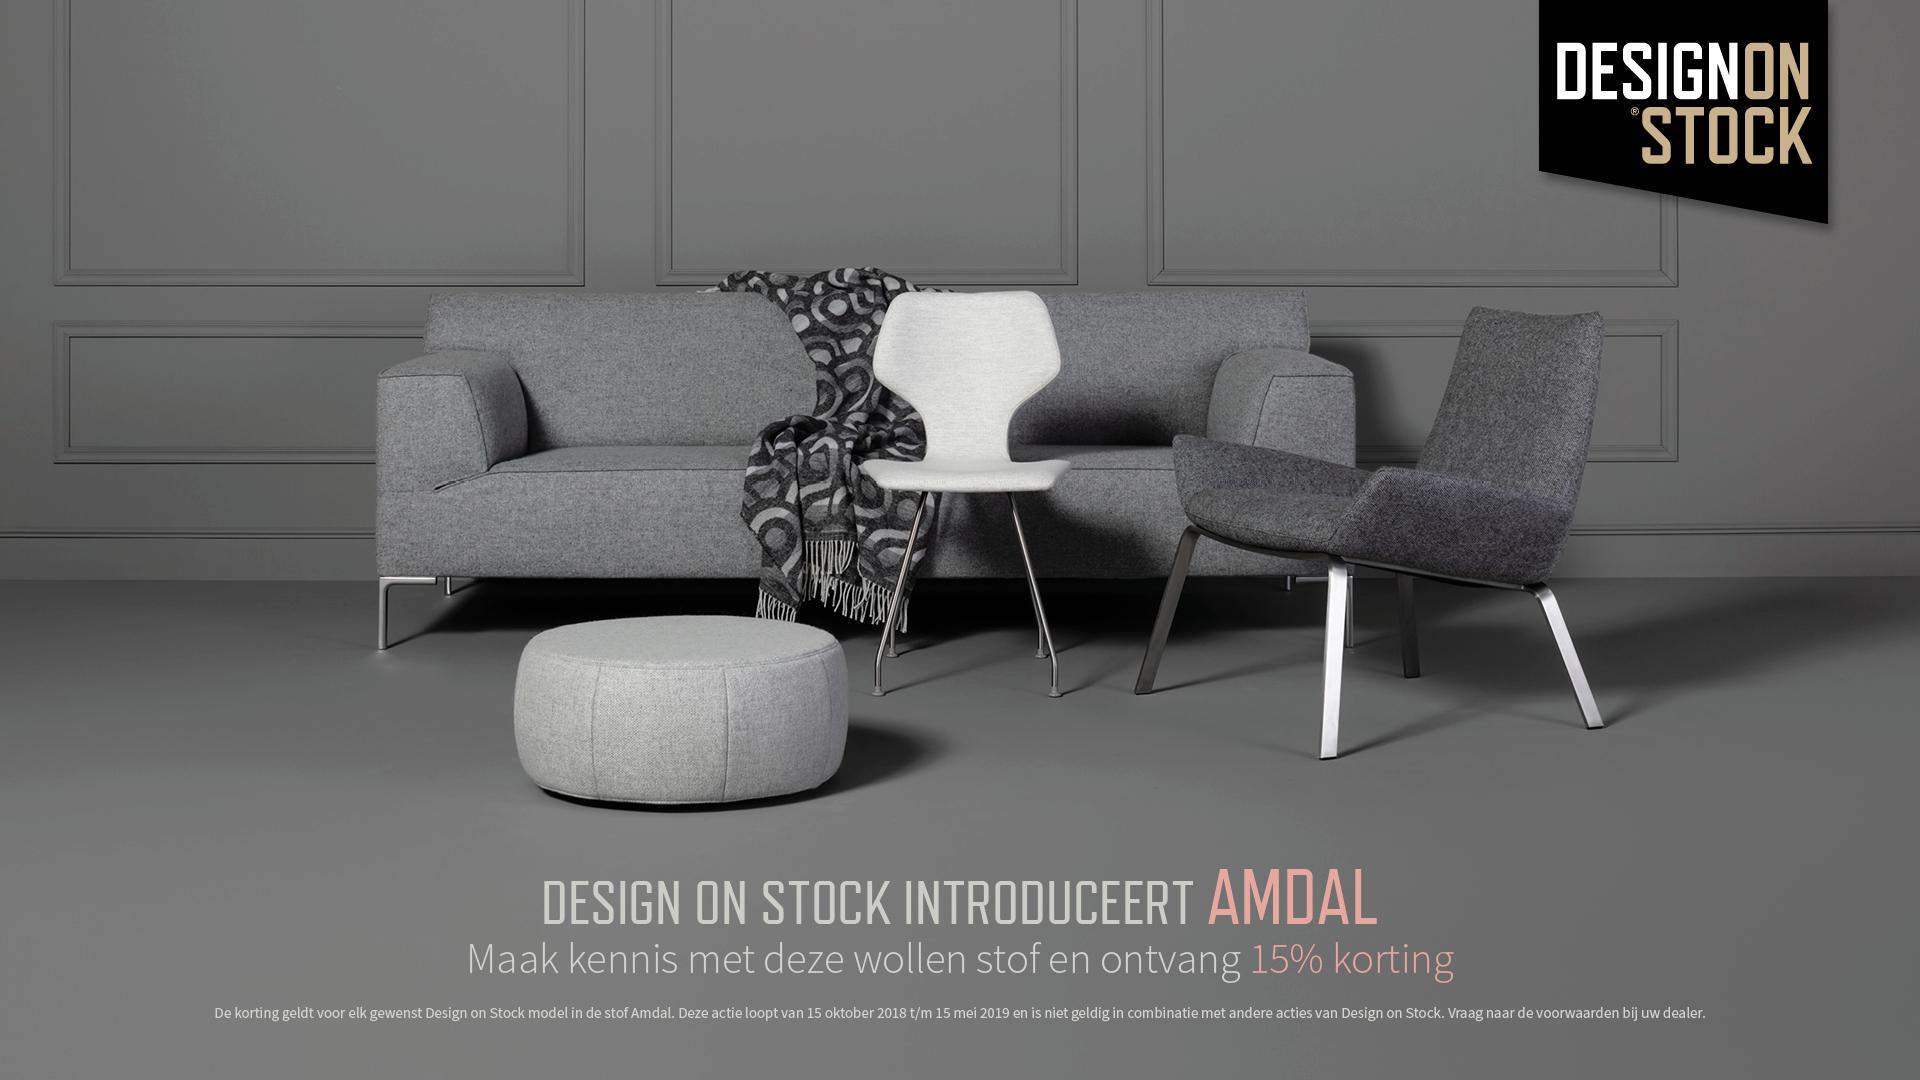 Design on stock introduceert amdal design meubelen interieur plus